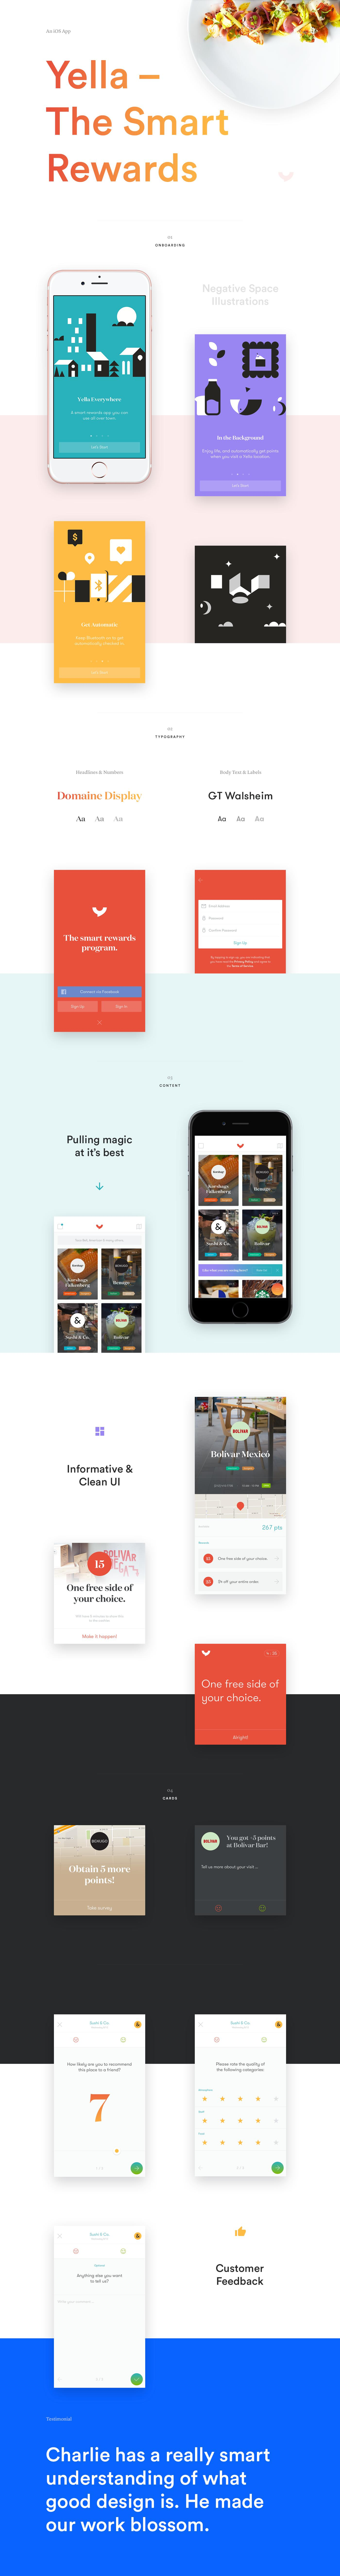 Yella - The Smart Rewards on Behance